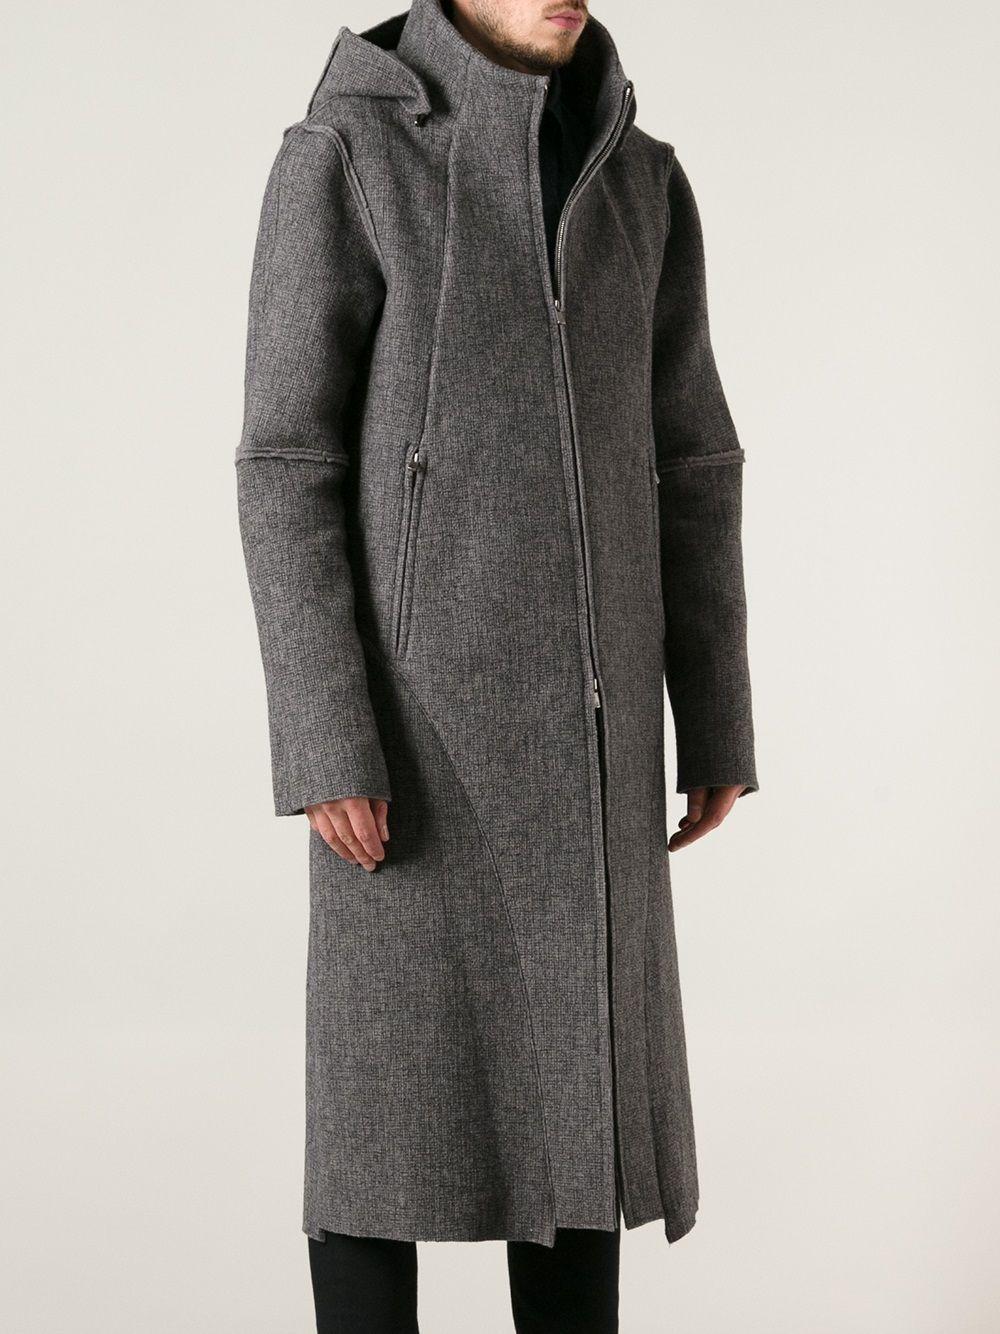 mens army great coat neil barrett - Google Search